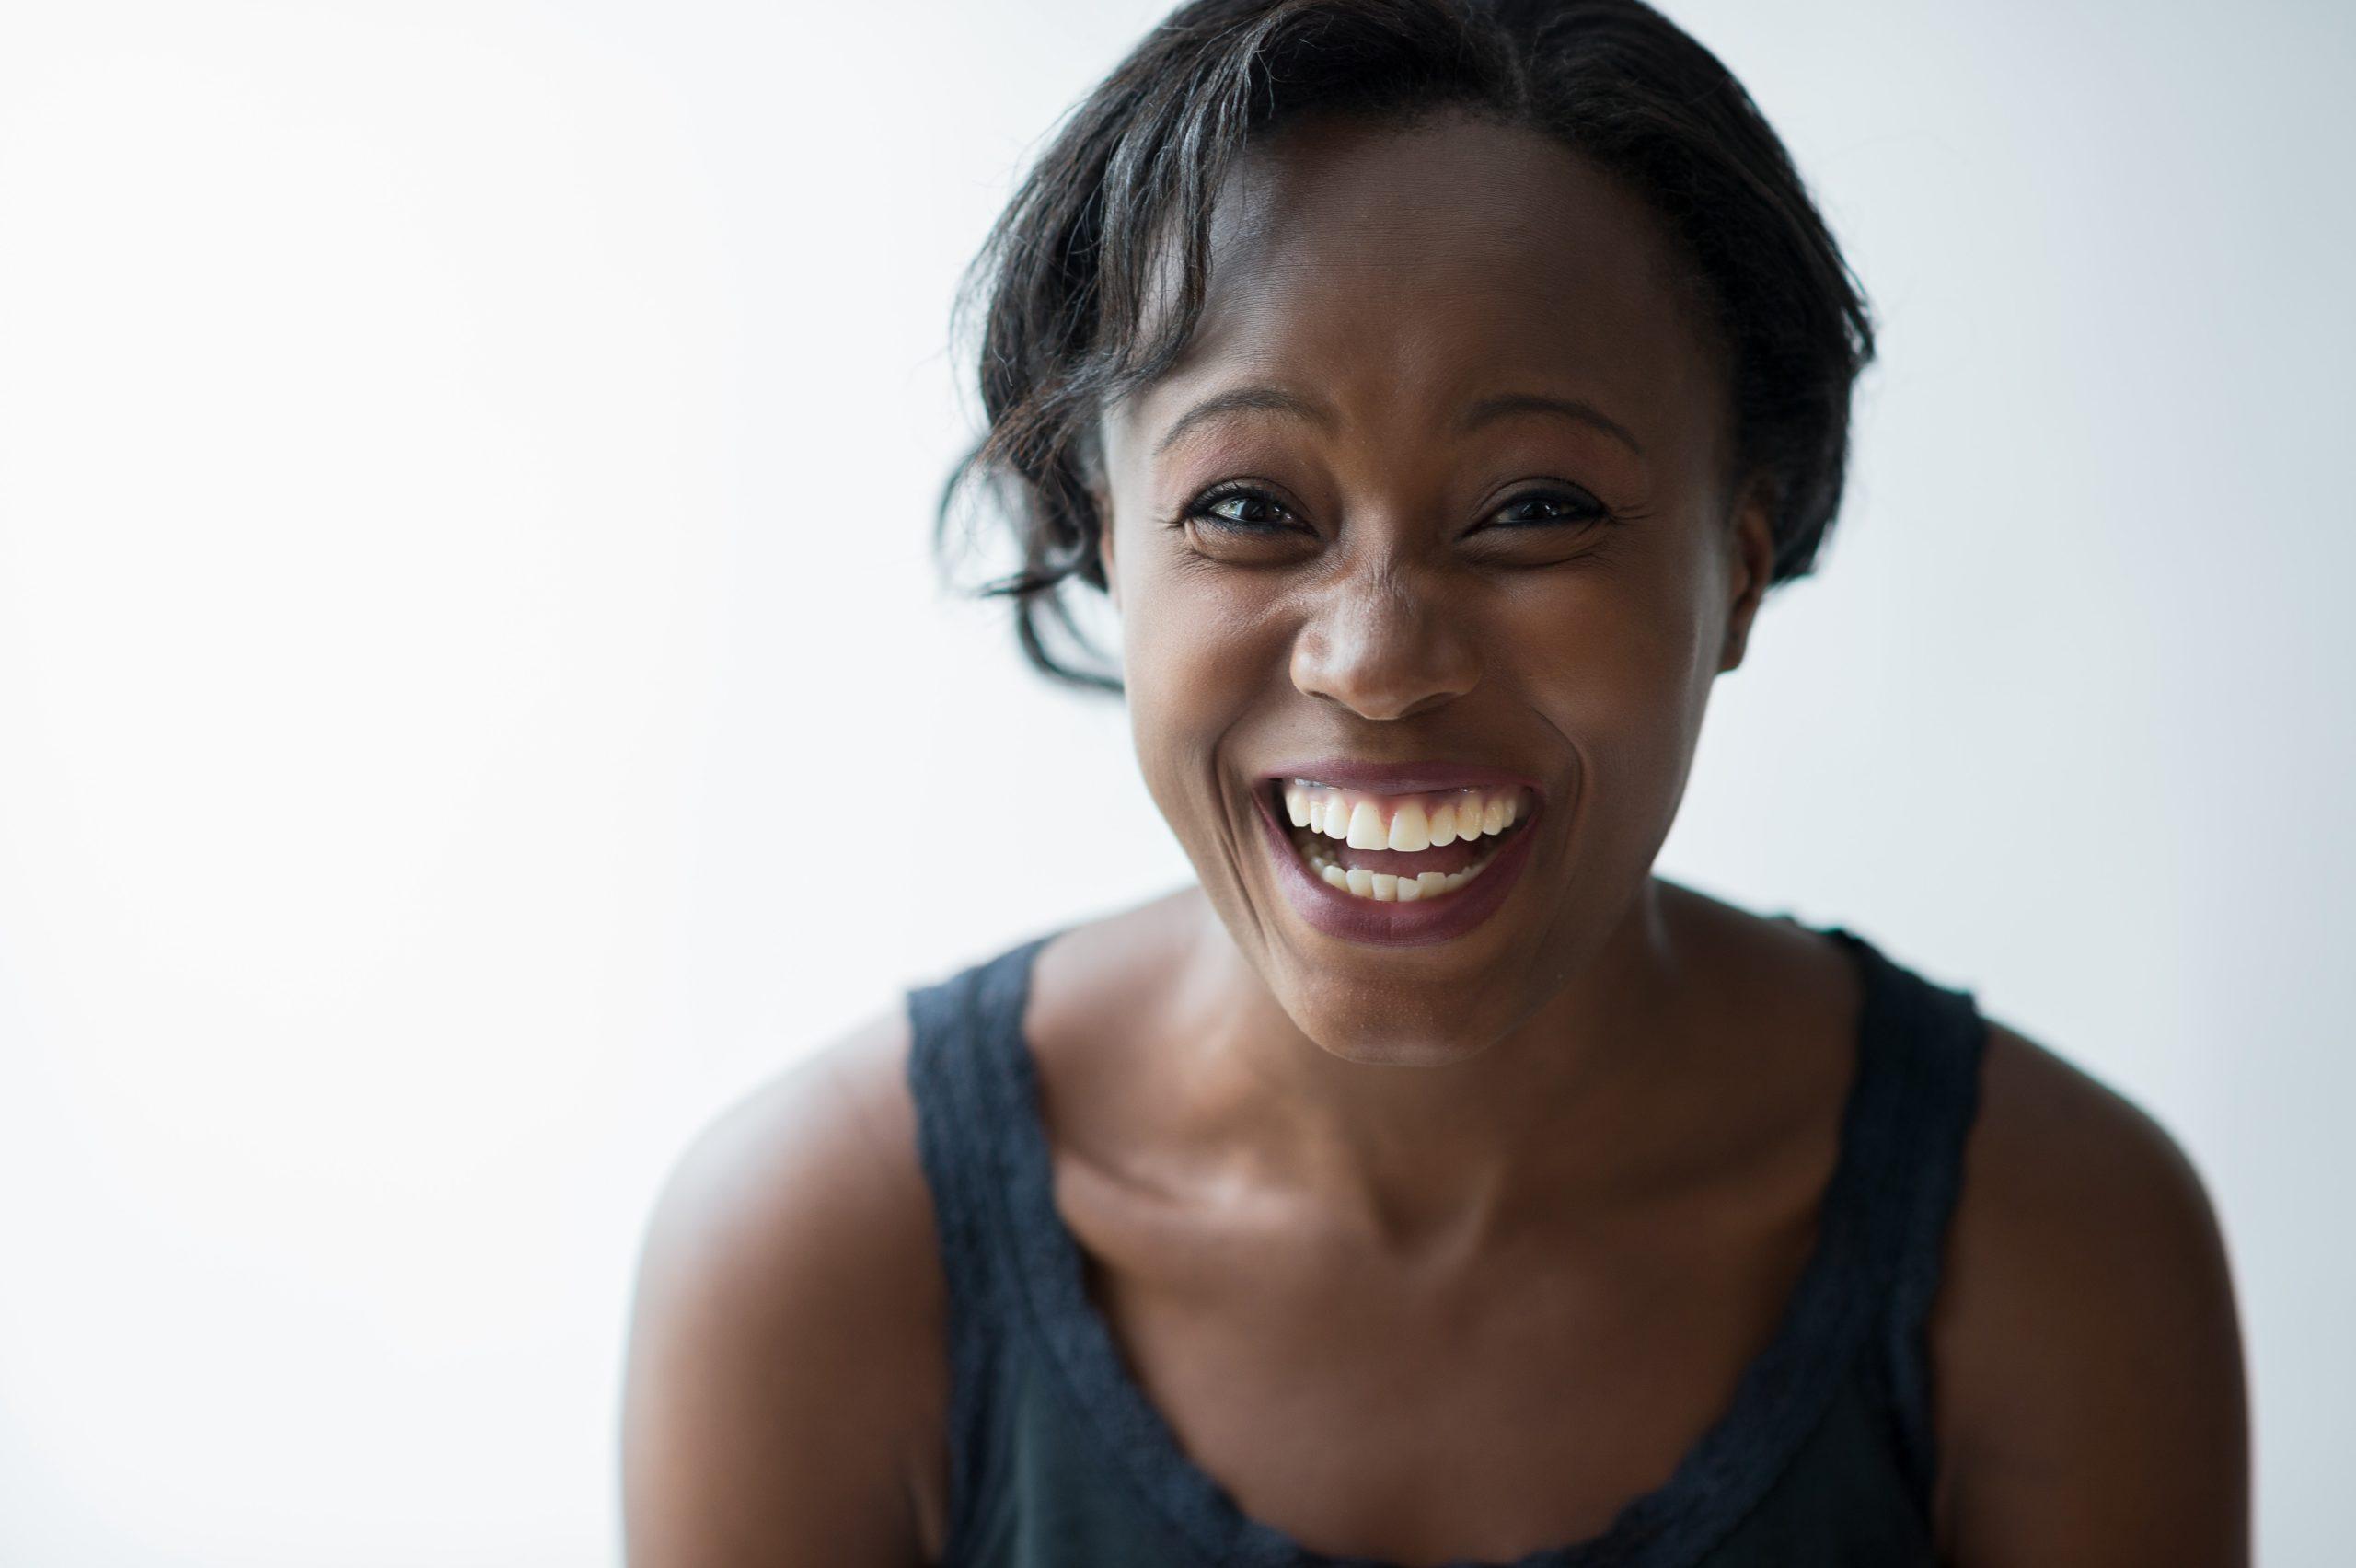 smiling woman 2